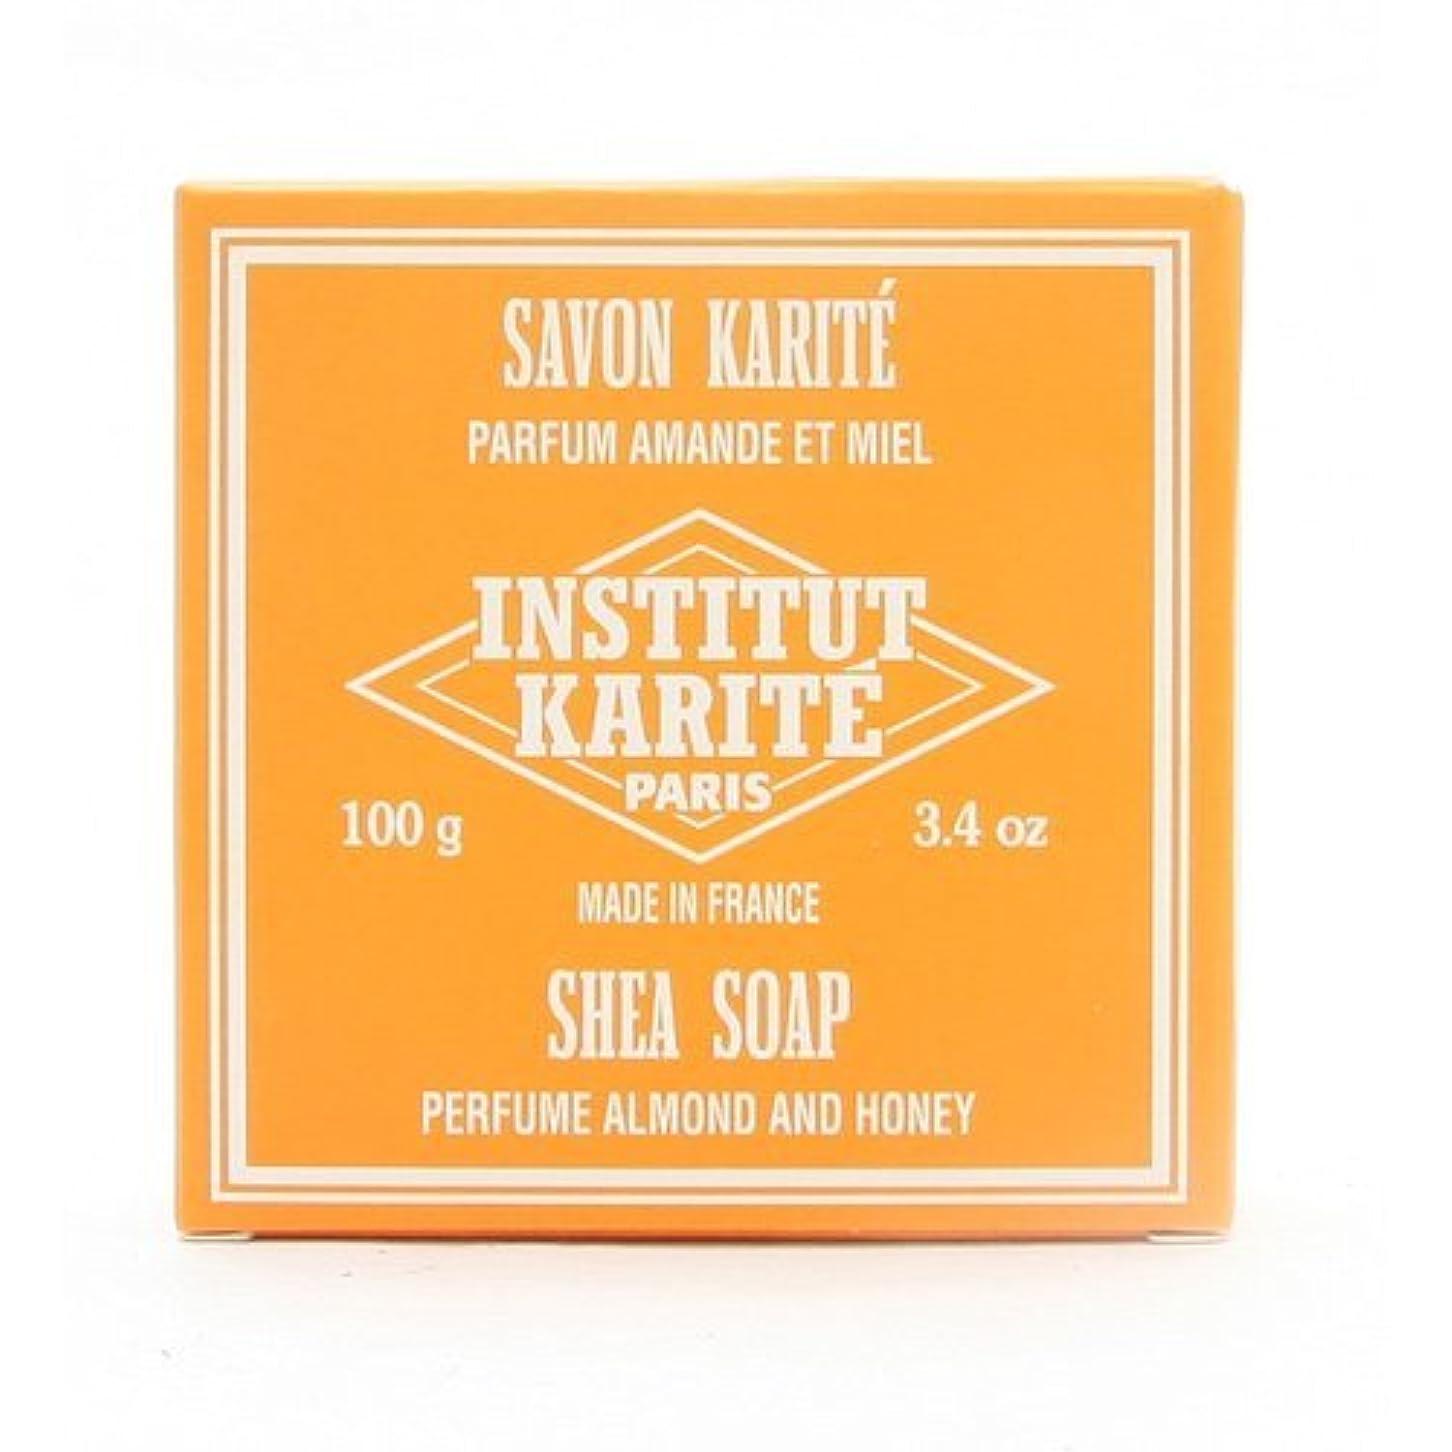 INSTITUT KARITE インスティテュート カリテ 25% Extra Gentle Soap ジェントルソープ 100g Almond Honey アーモンドハニー